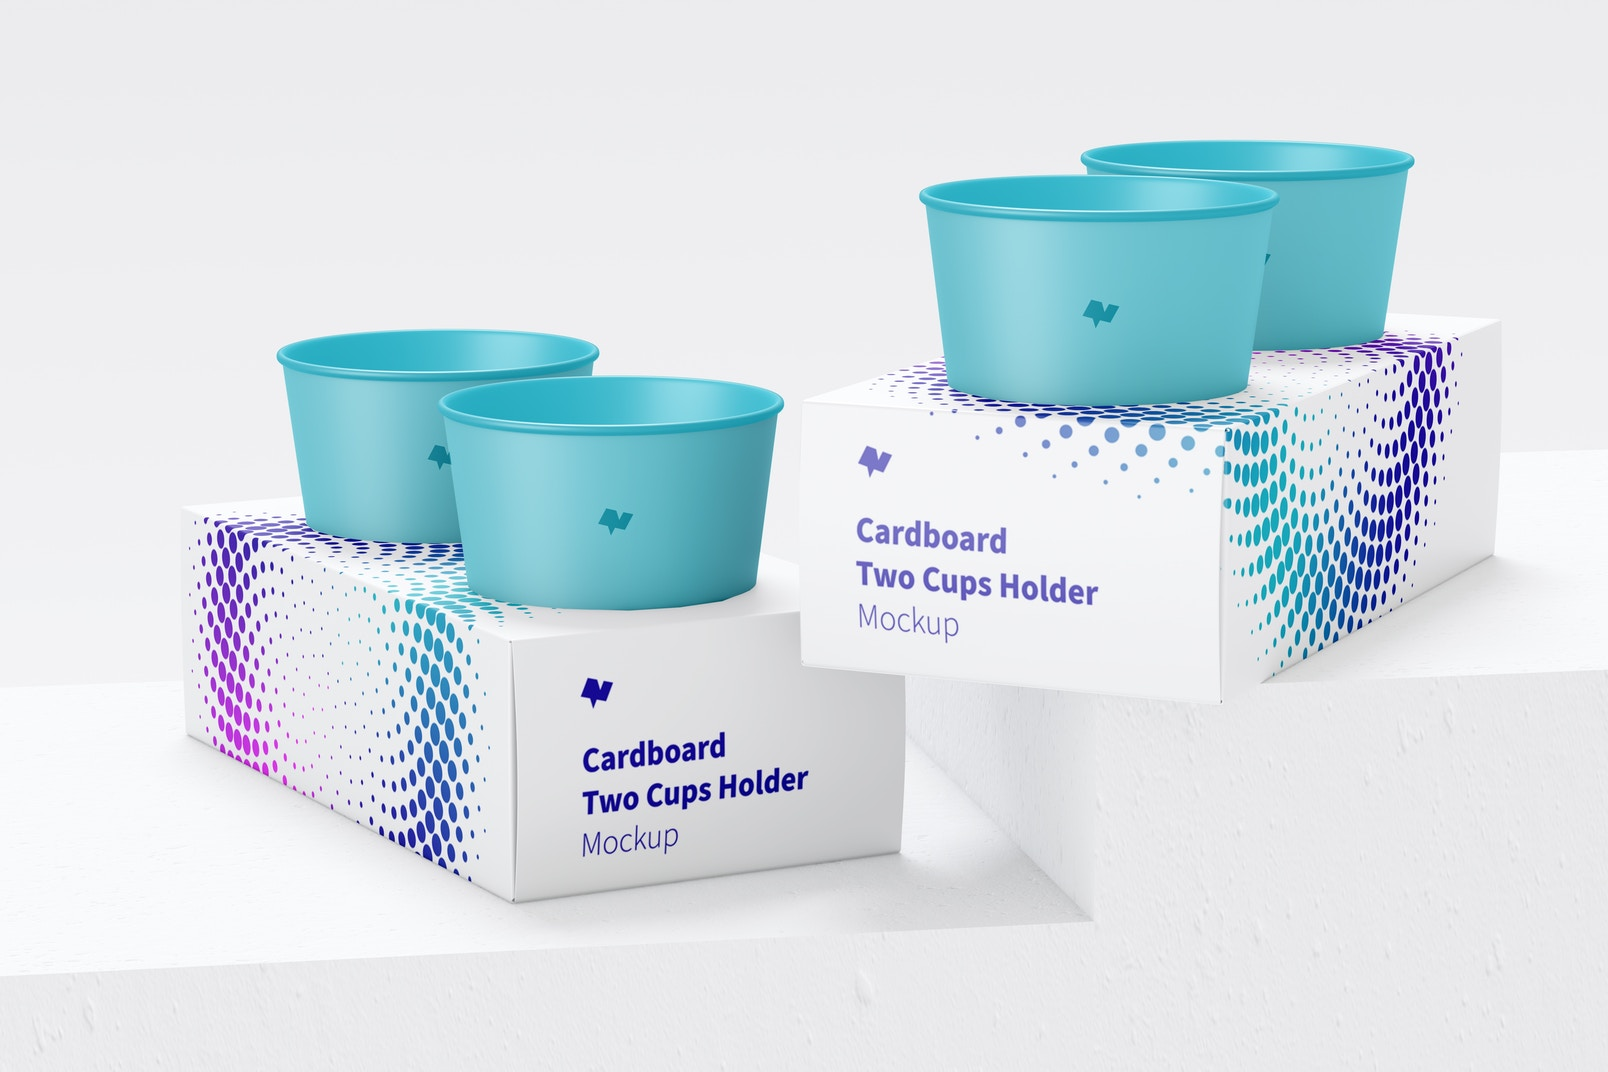 Cardboard Two Cups Holders Mockup